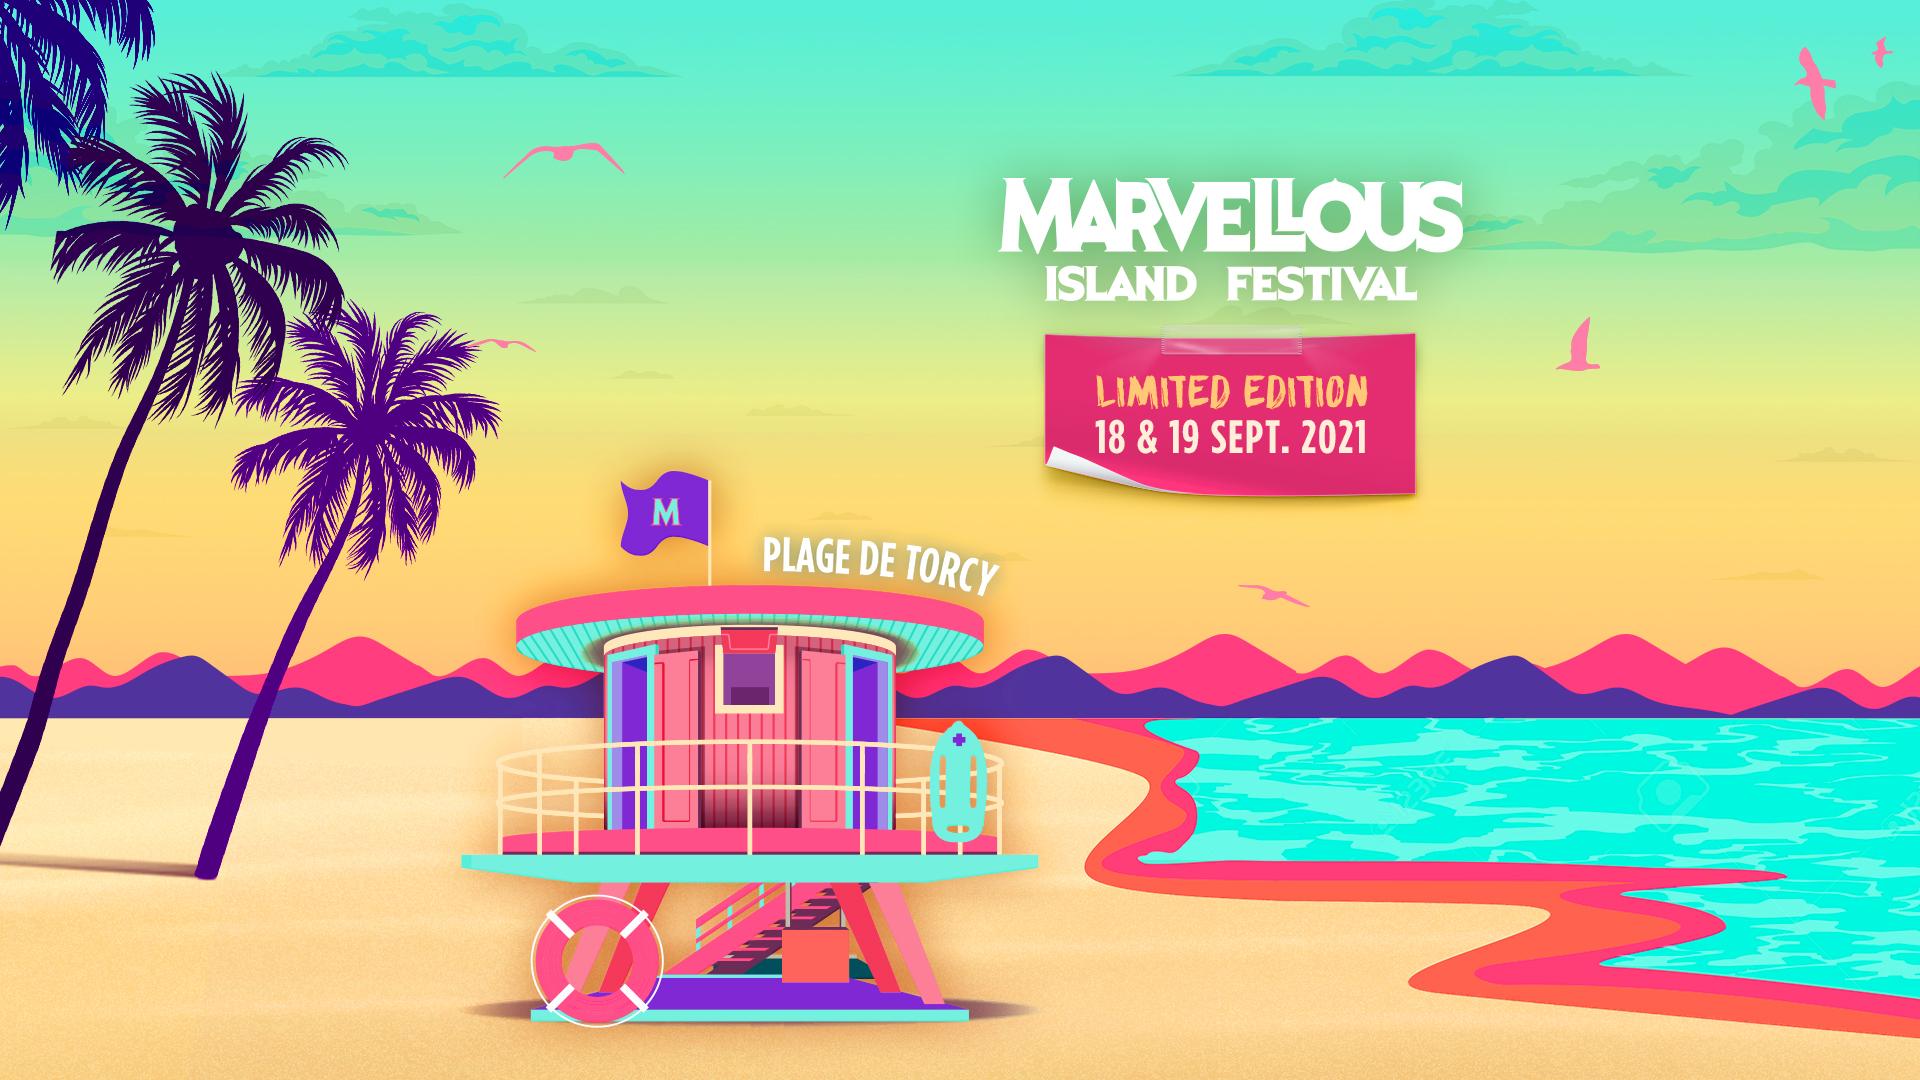 MARVELLOUS ISLAND 2021 : LIMITED EDITION